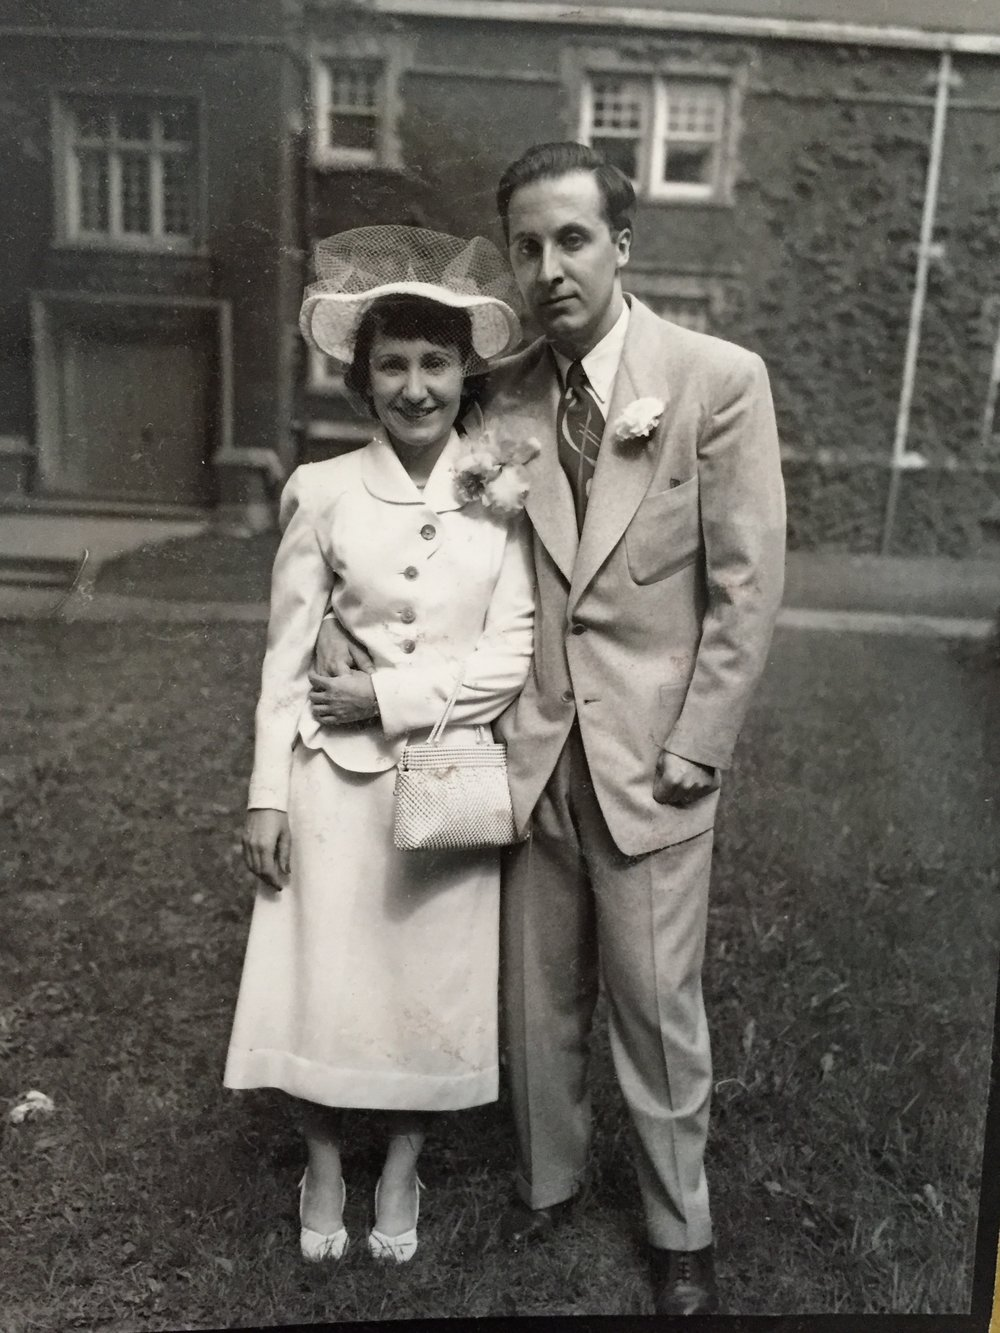 Amelia and Dr. Rudolf Wilhelm